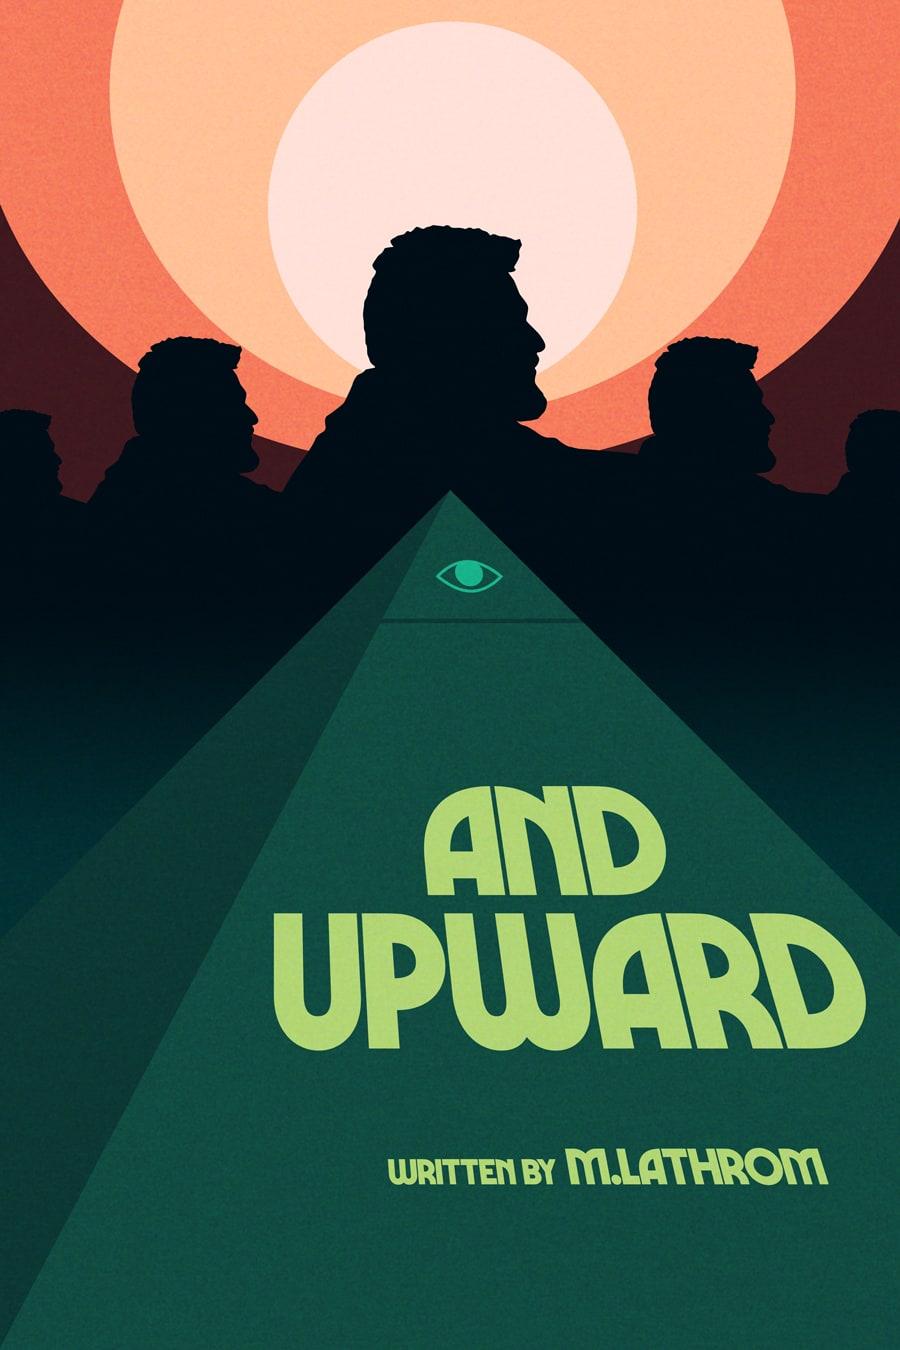 And Upward Poster